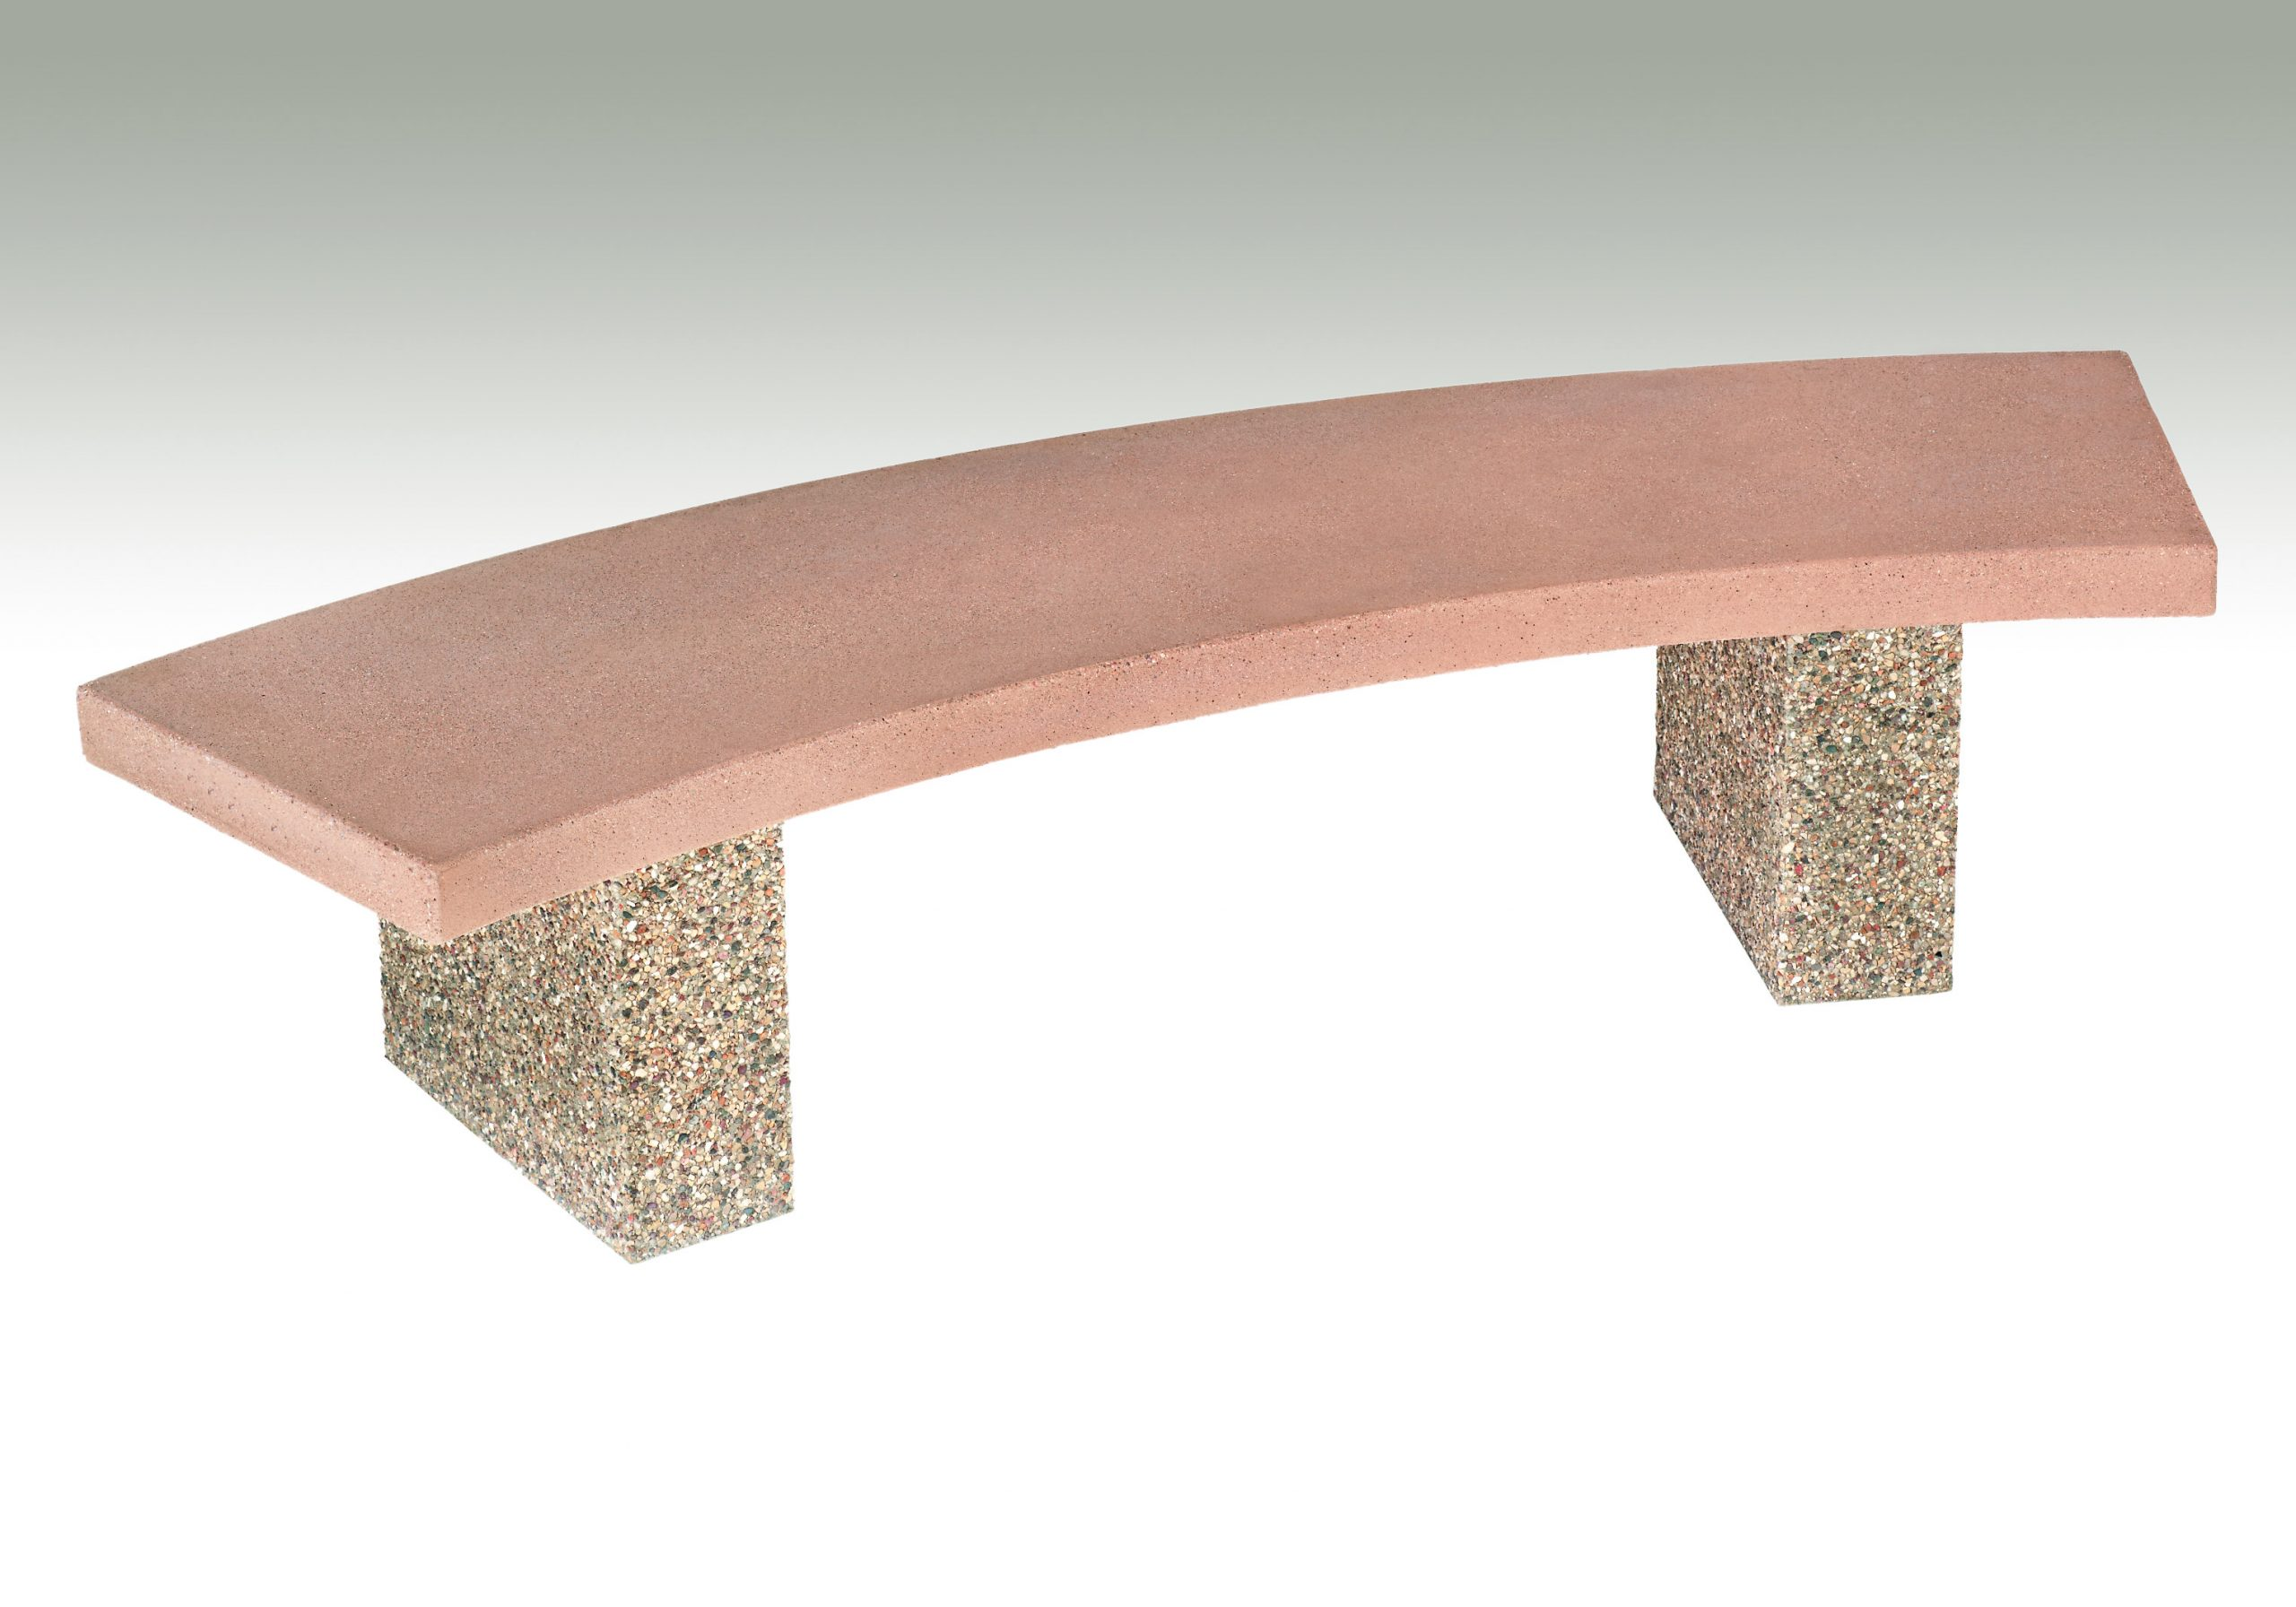 Radius Bench #1030